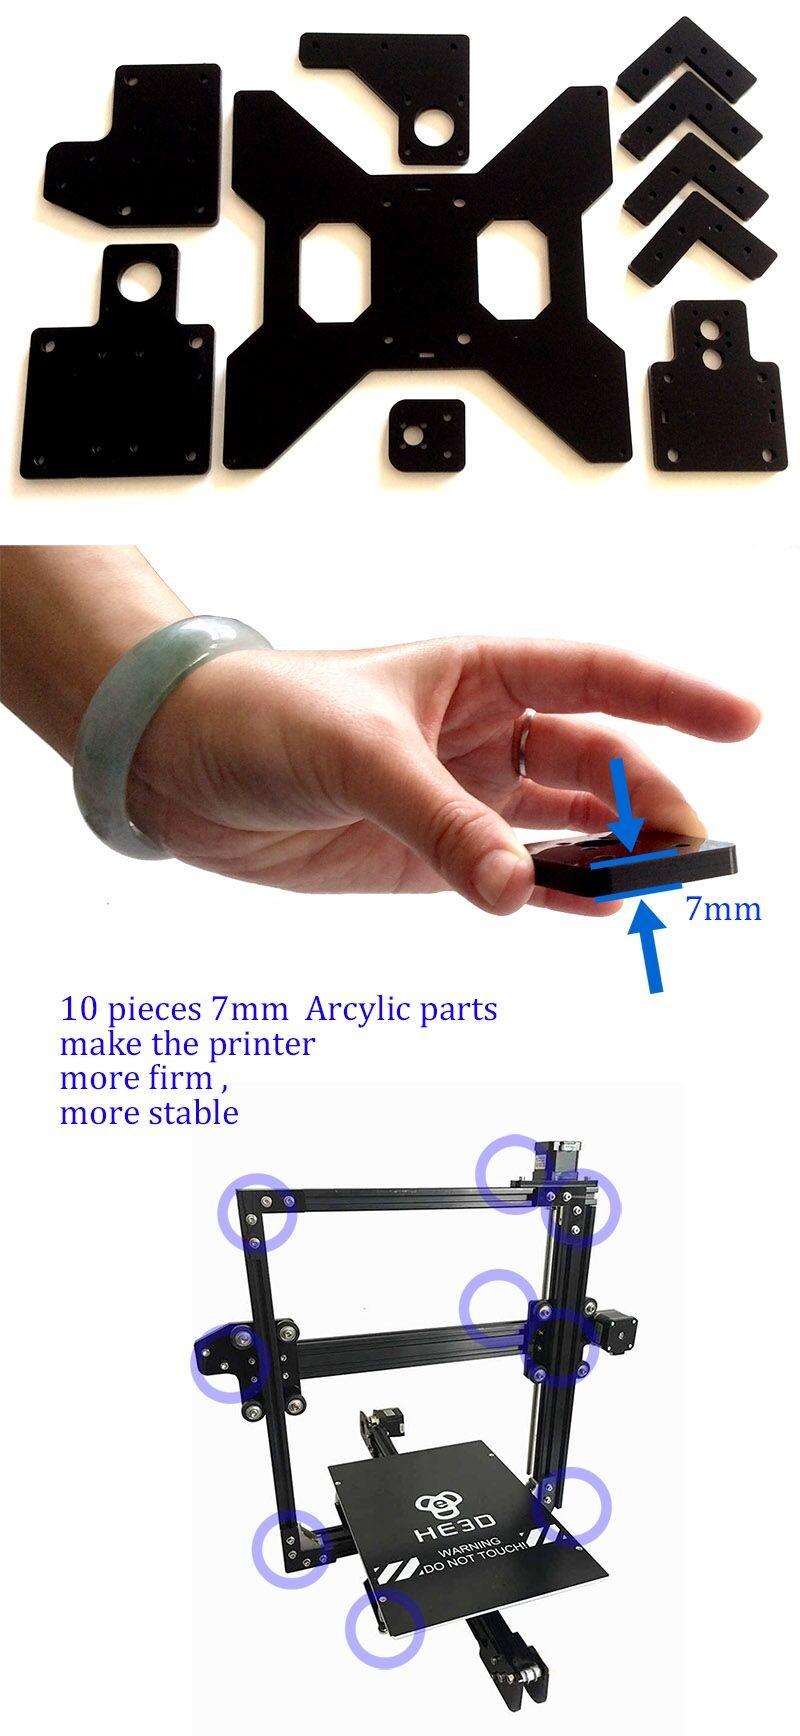 acrylic parts